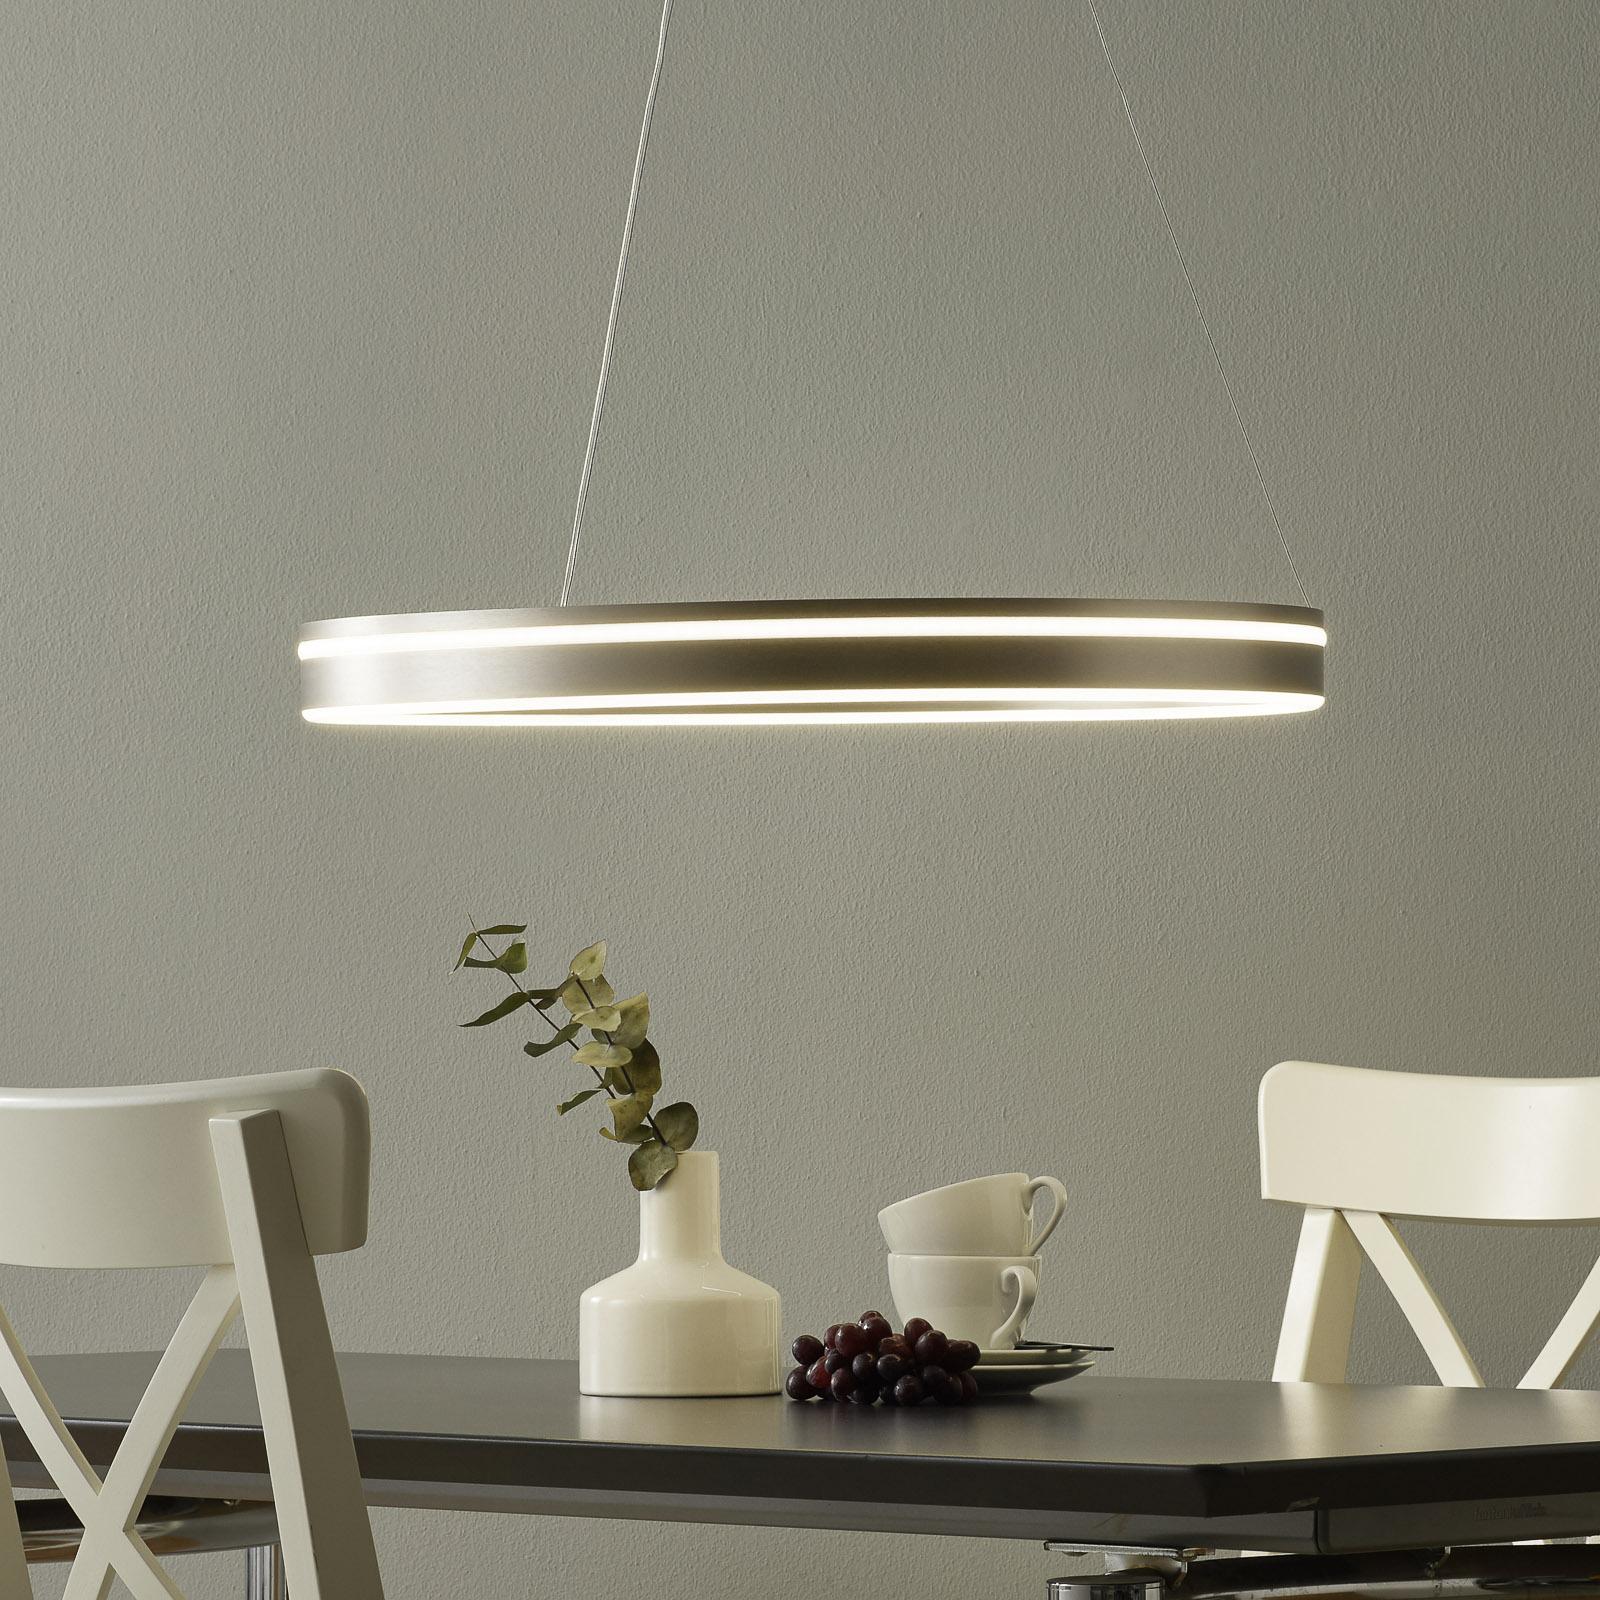 Paul Neuhaus Q-VITO LED-riippuvalaisin 59 cm teräs